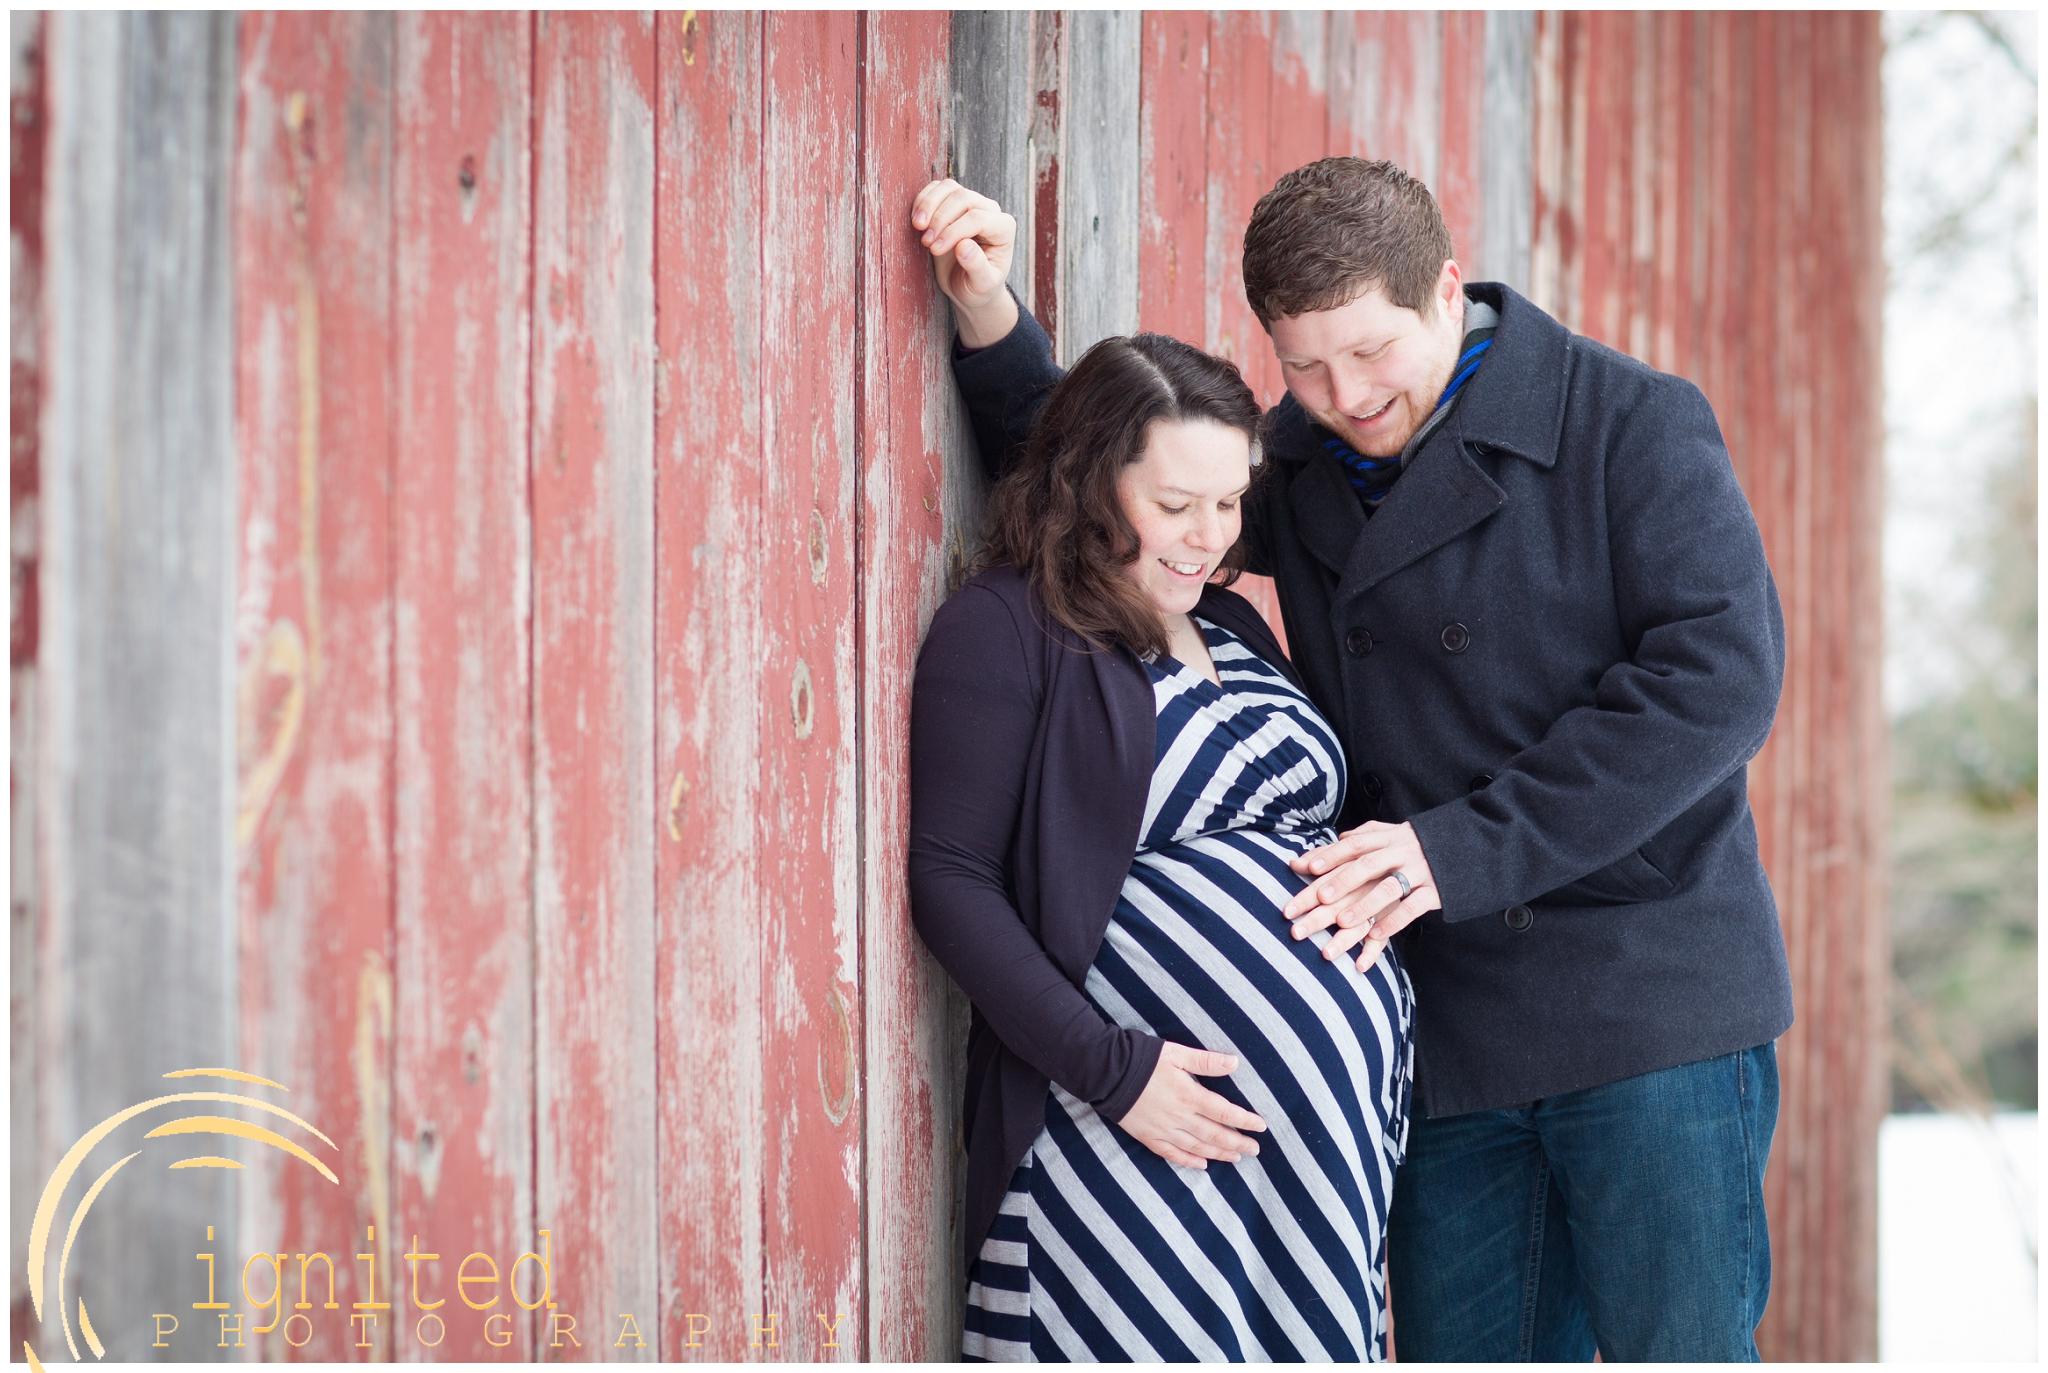 ignited Photography Wayne and Elizabeth Wright Maternity Portraits Brighton Howell Michigan_0001.jpg